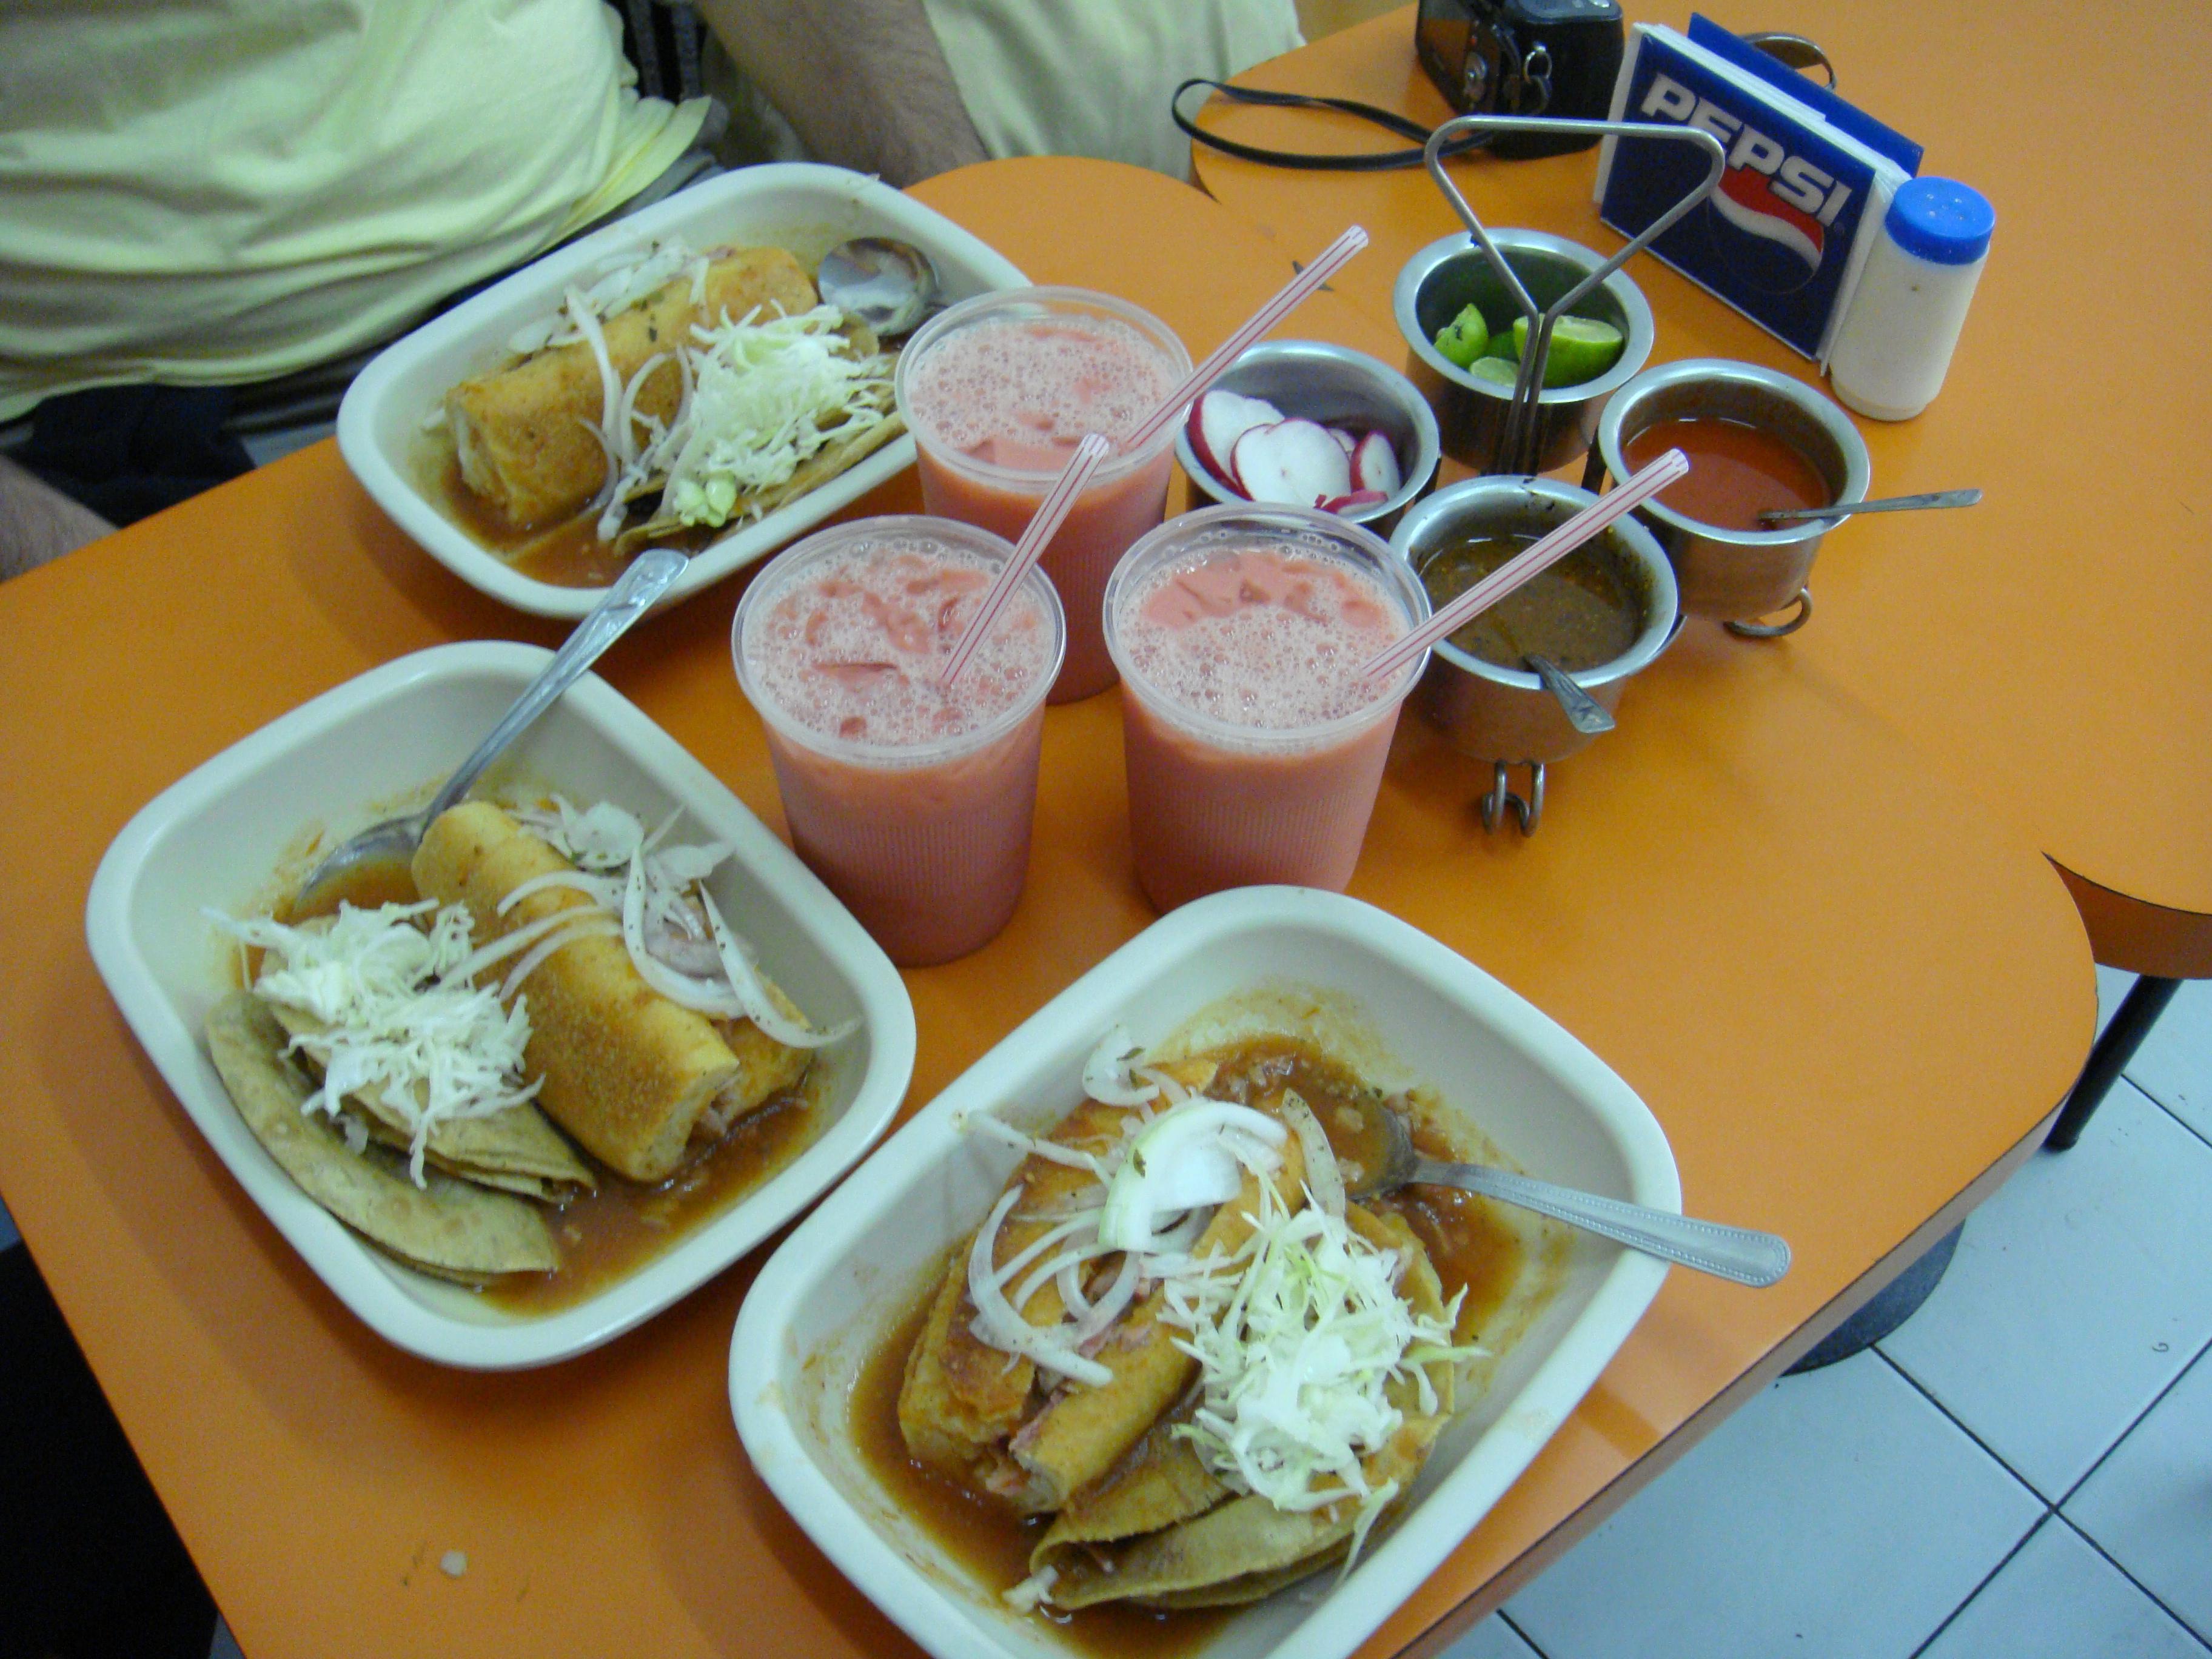 Comida mexicana  Ahorita mismo